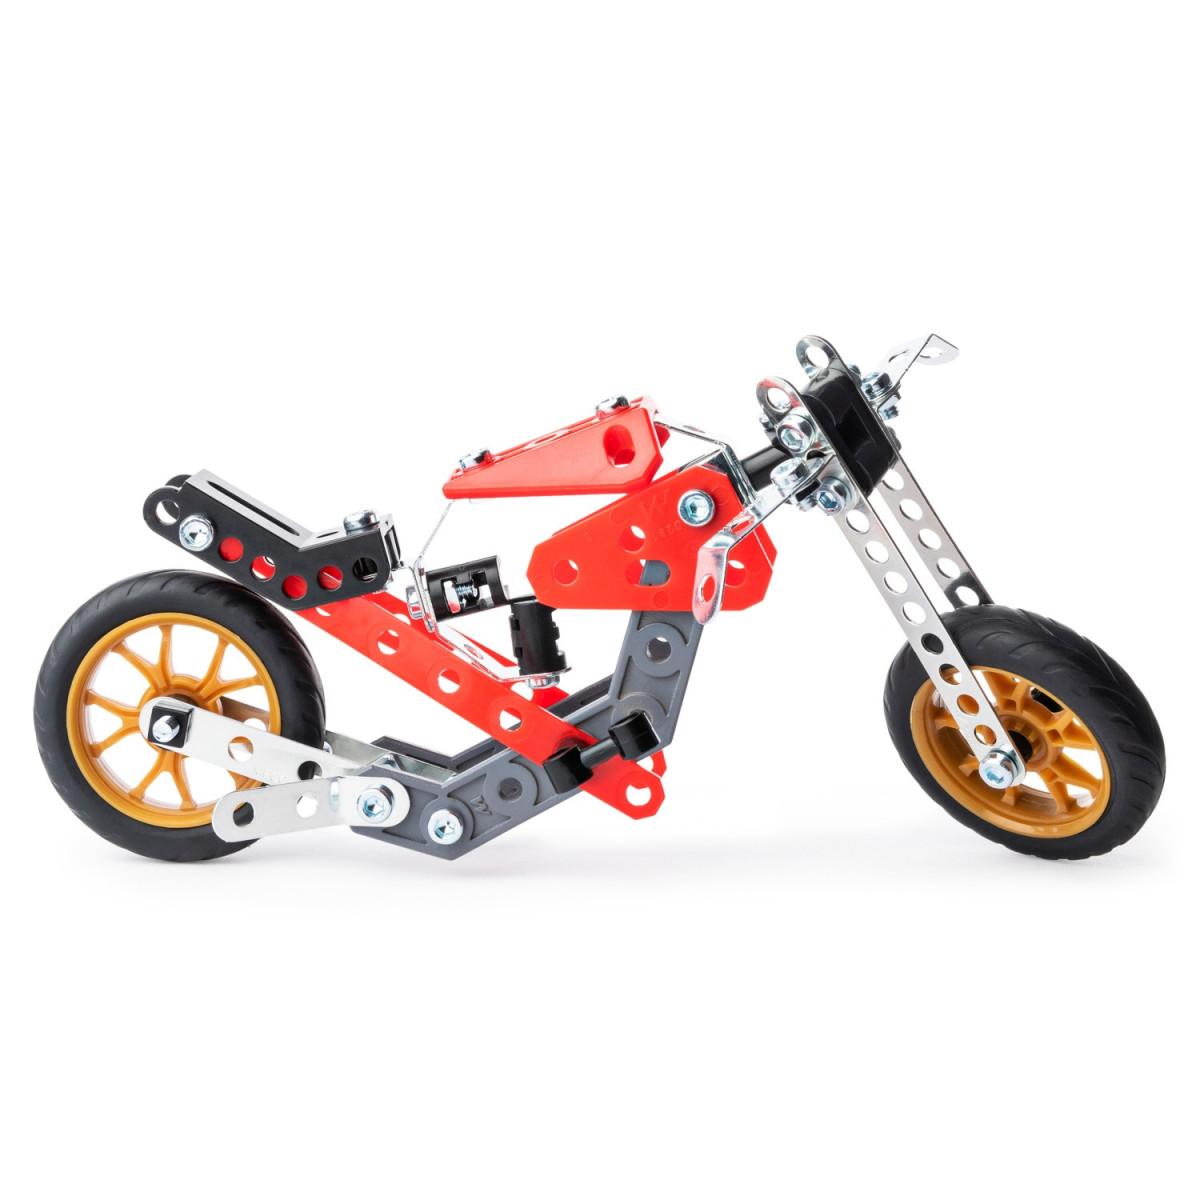 6053371 VOITURE ET MOTO 5 MODELES MECCANO MOB